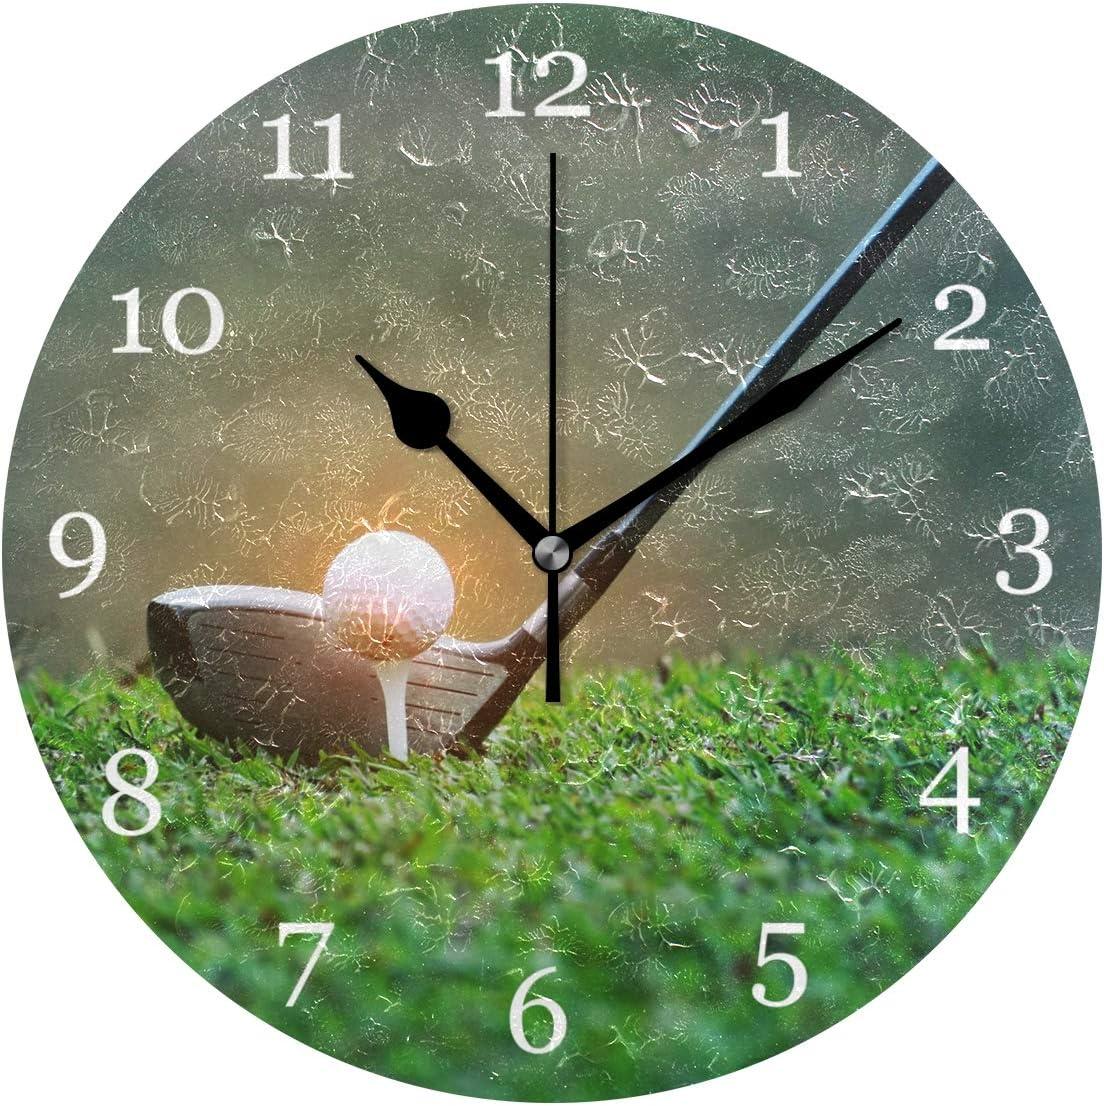 KUWT Sport Golf Ball Club Wall Clock Silent Non-Ticking 9.5 Inch Round Clock Acrylic Art Painting Home Office School Decor